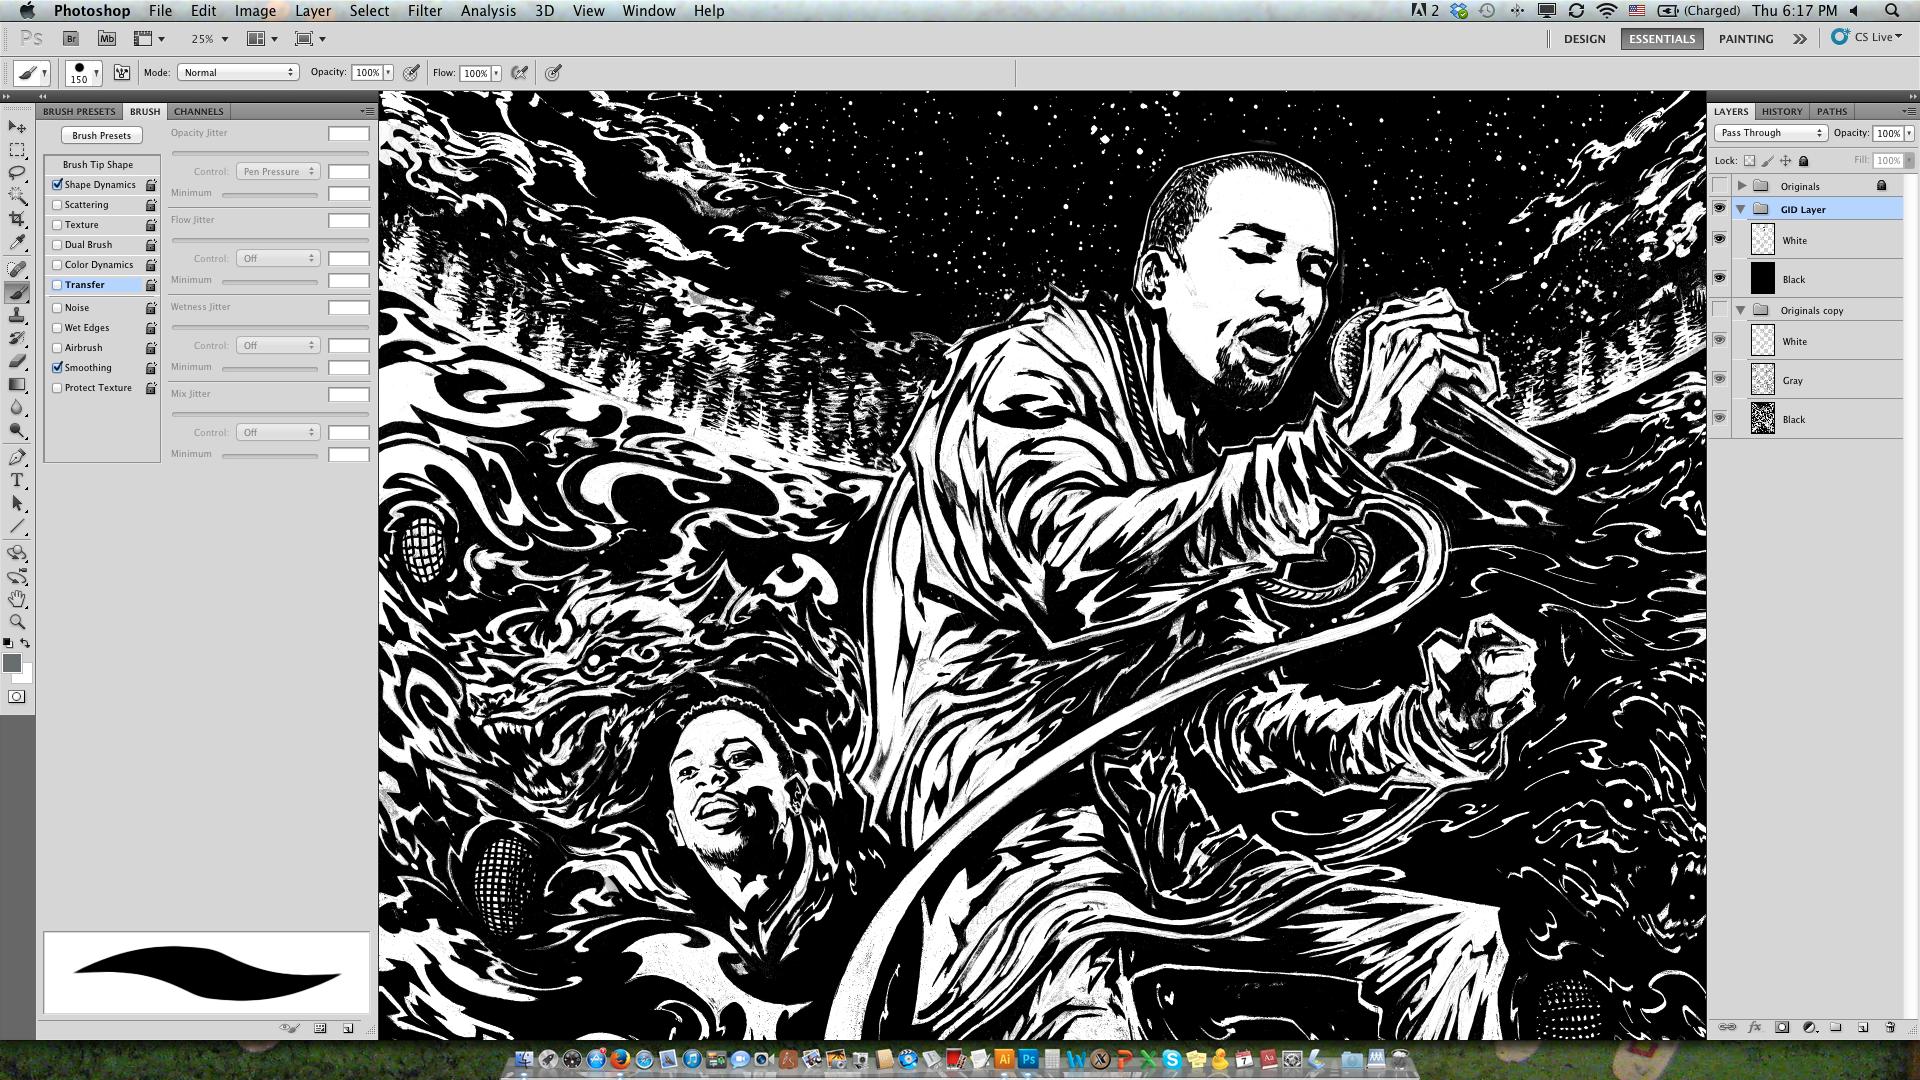 silkscreen-kanye_west-2013_11_27-32